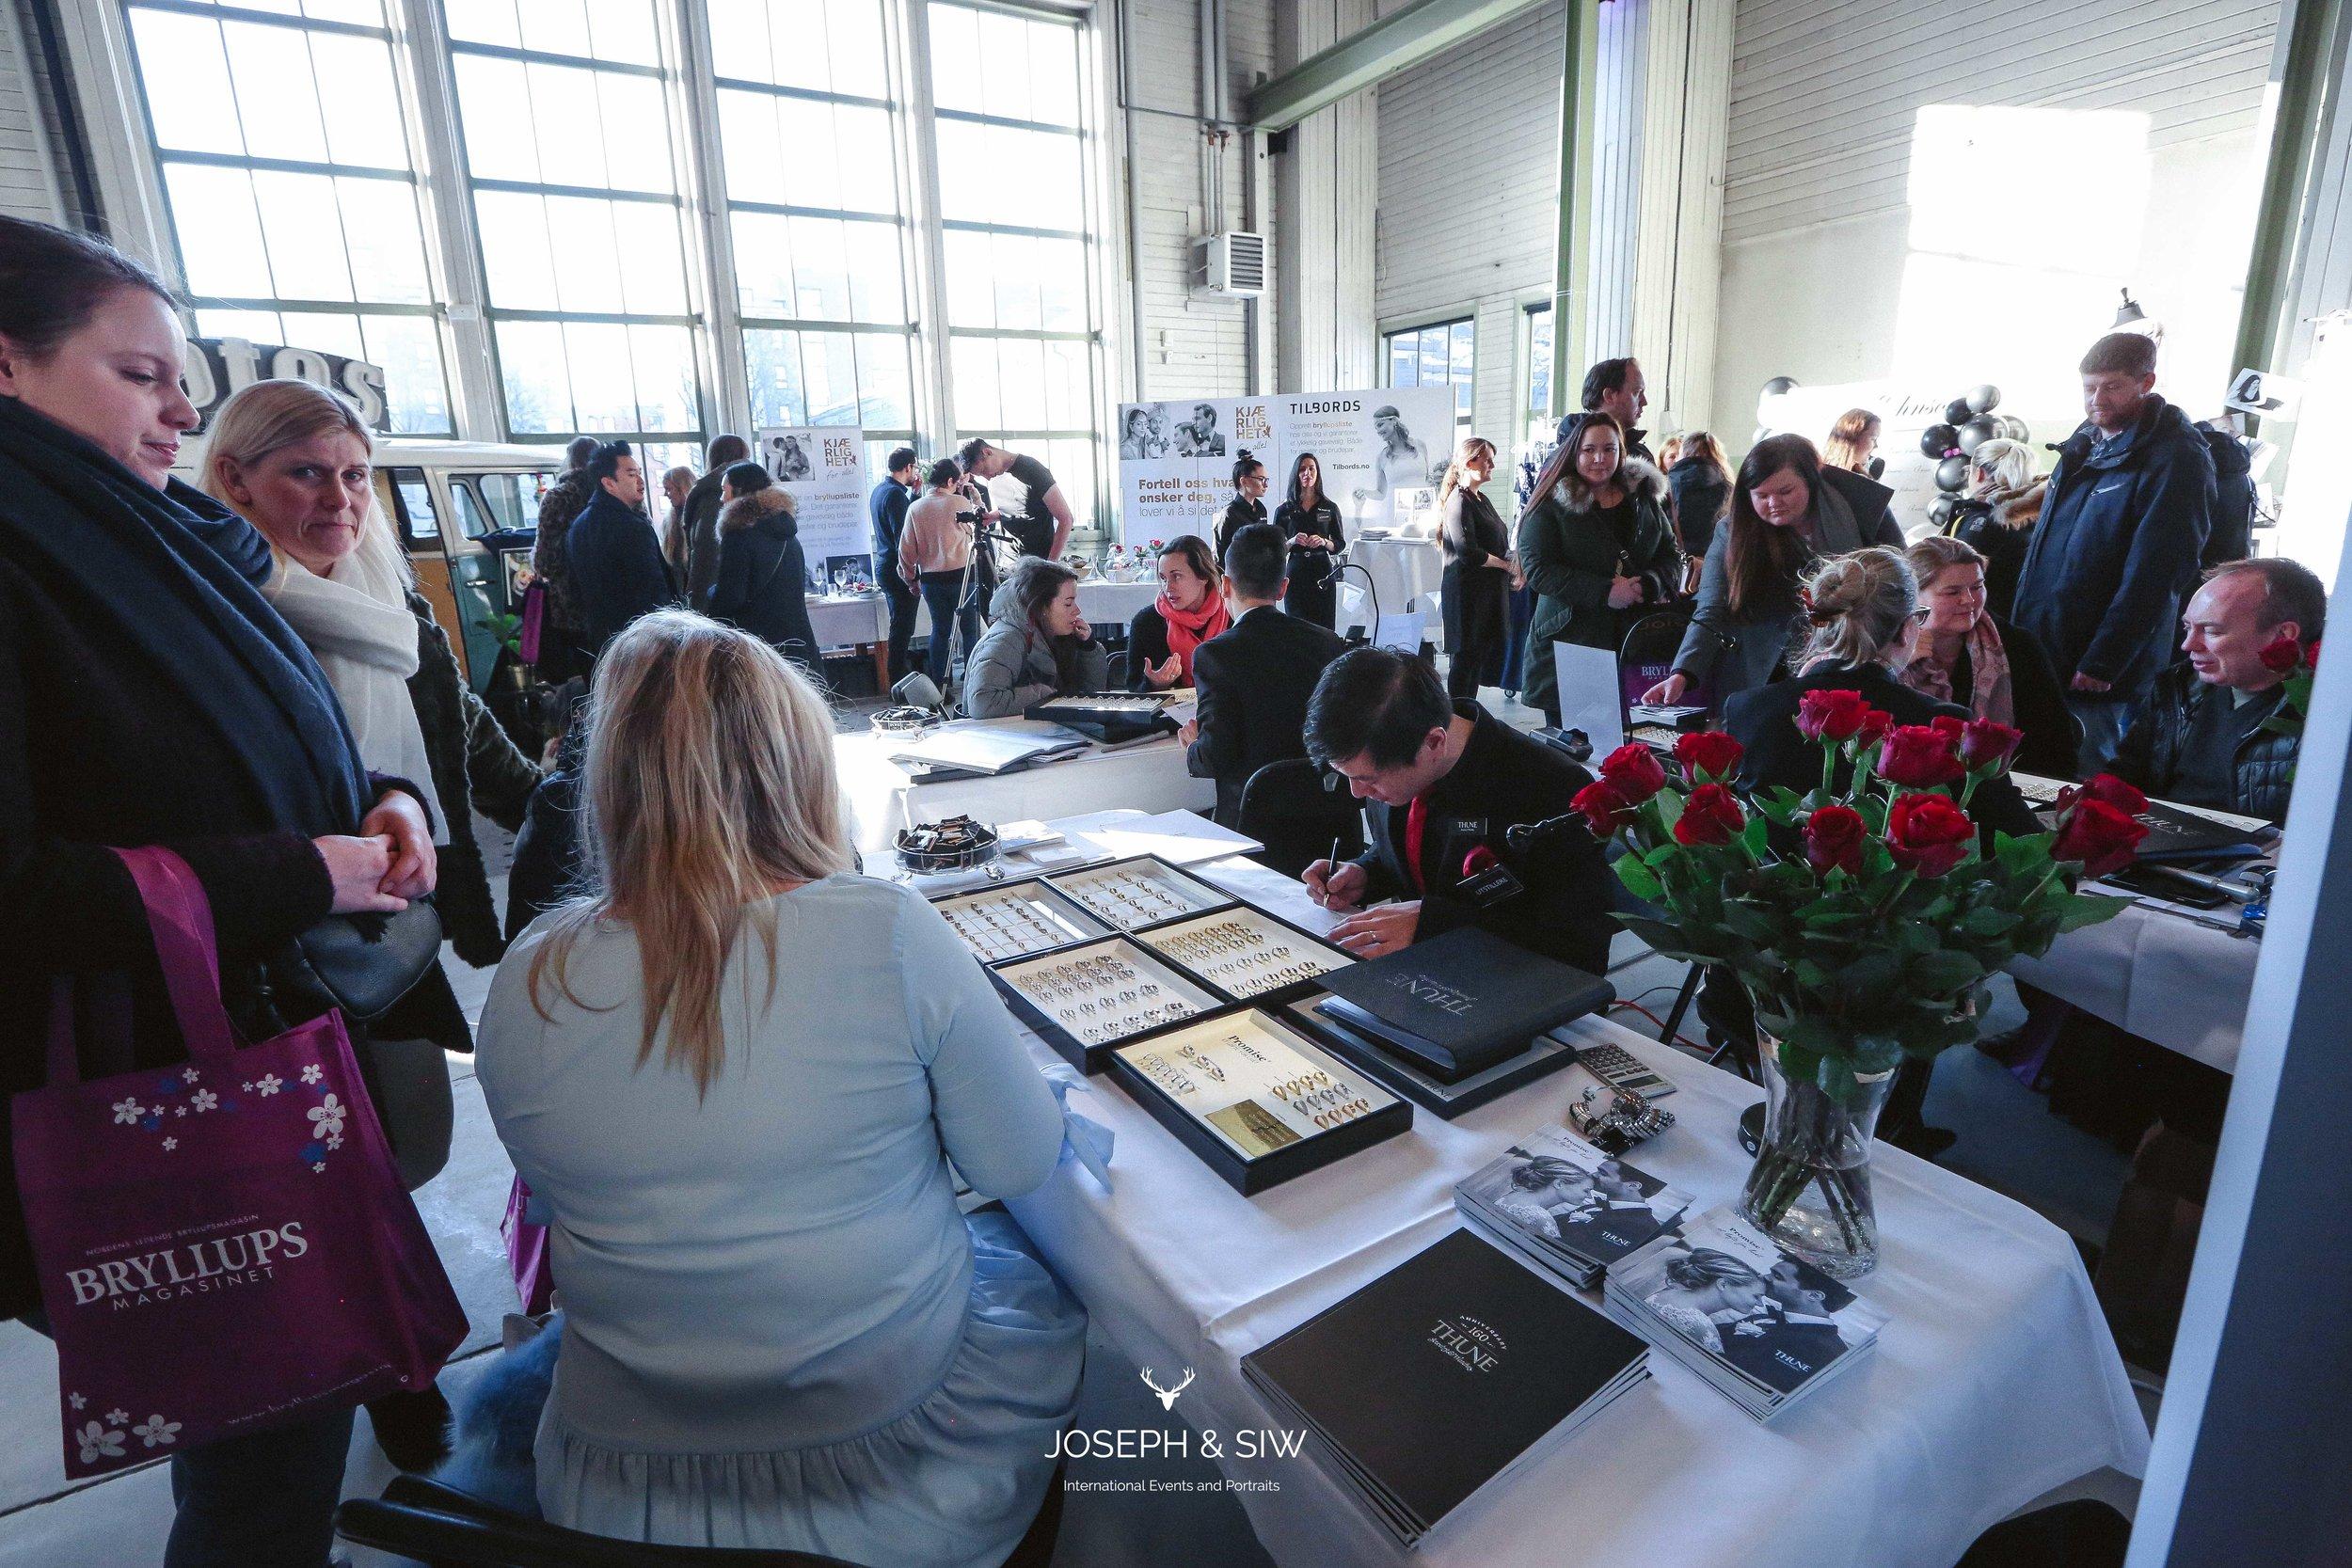 mittbryllup_bryllupsmesse_i_oslo_052.jpg